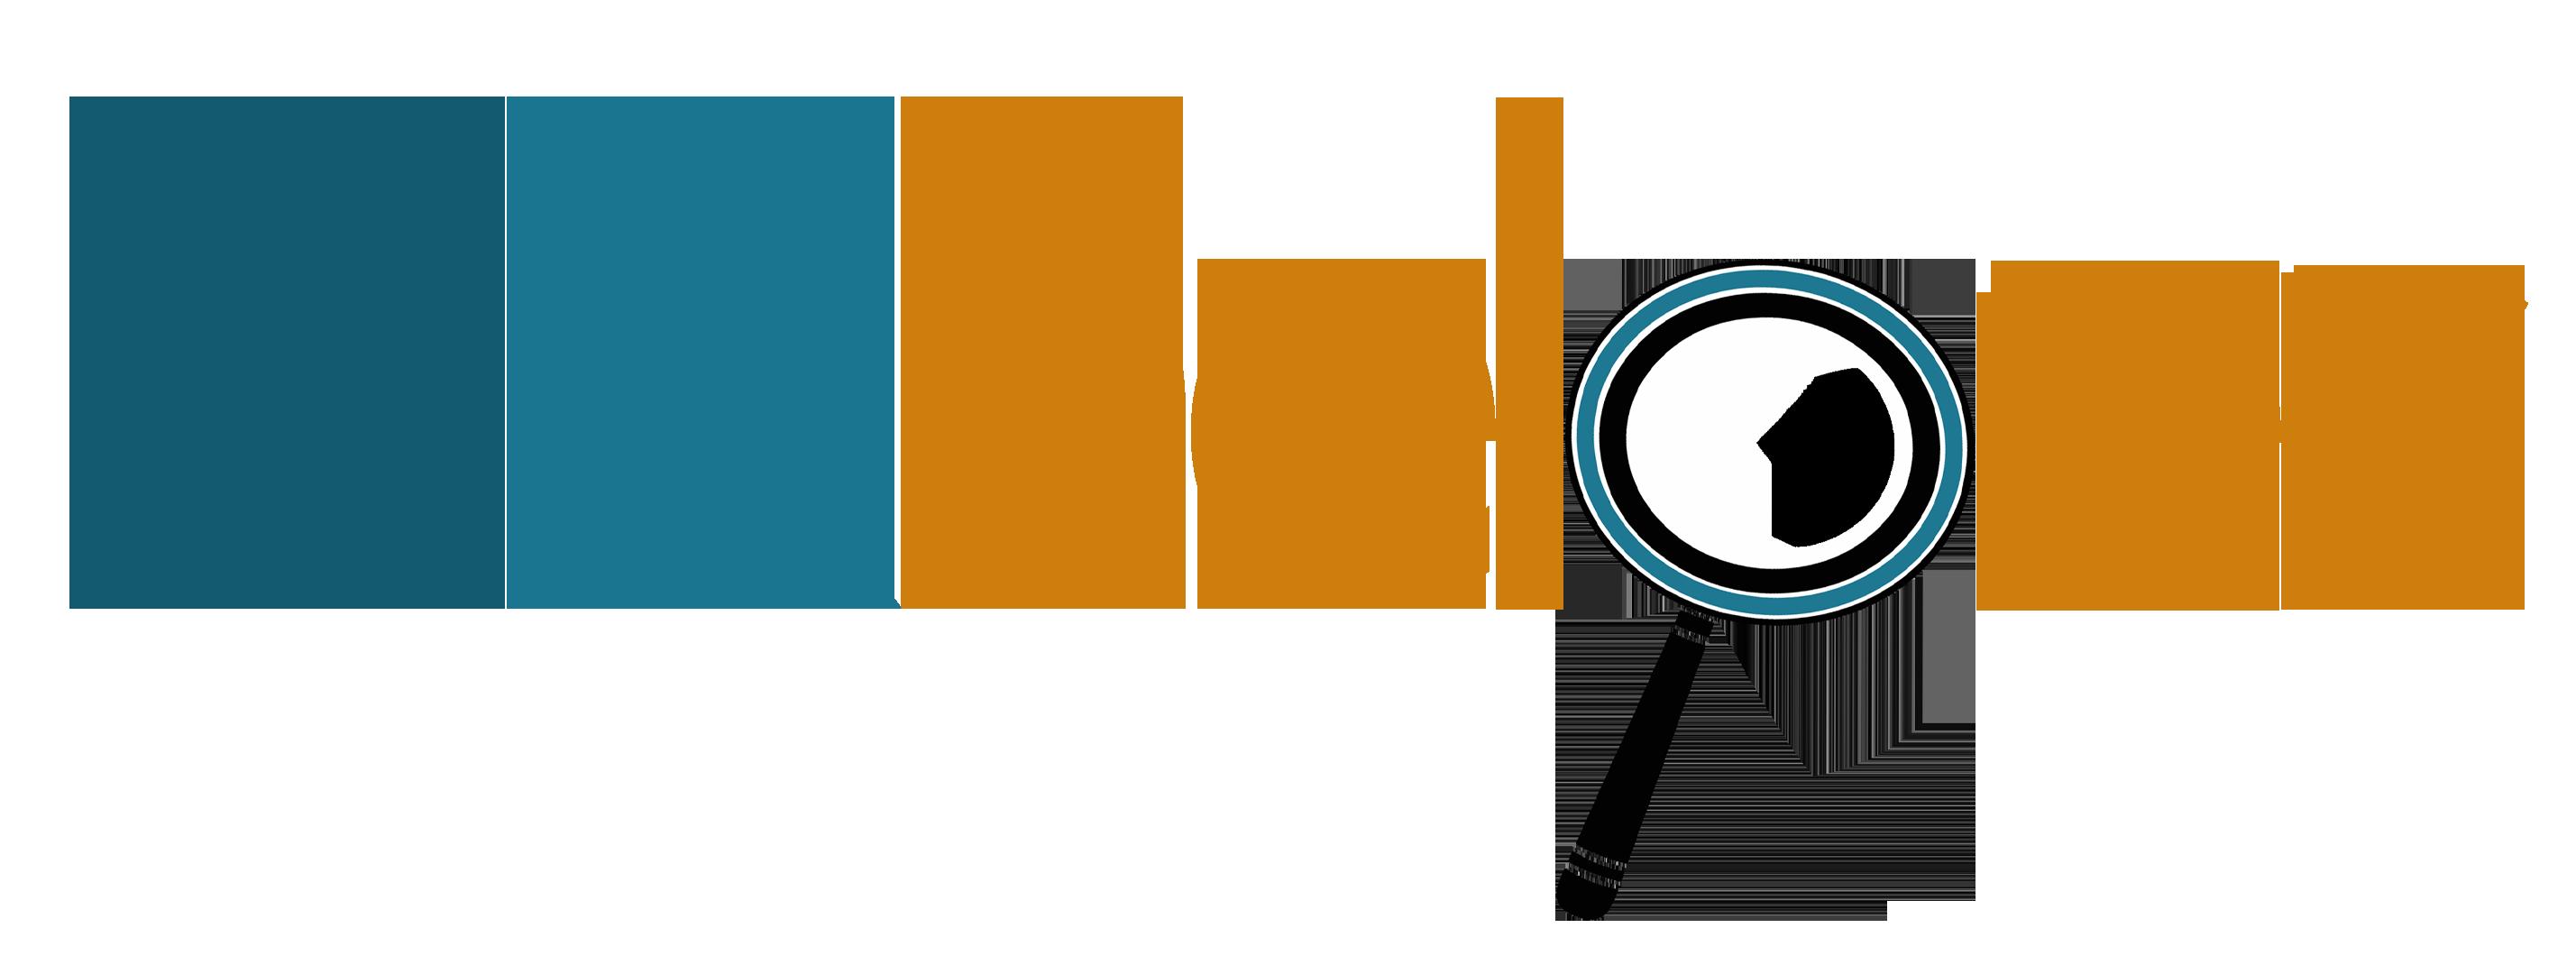 HRHelper where letter P is a magnifying glass